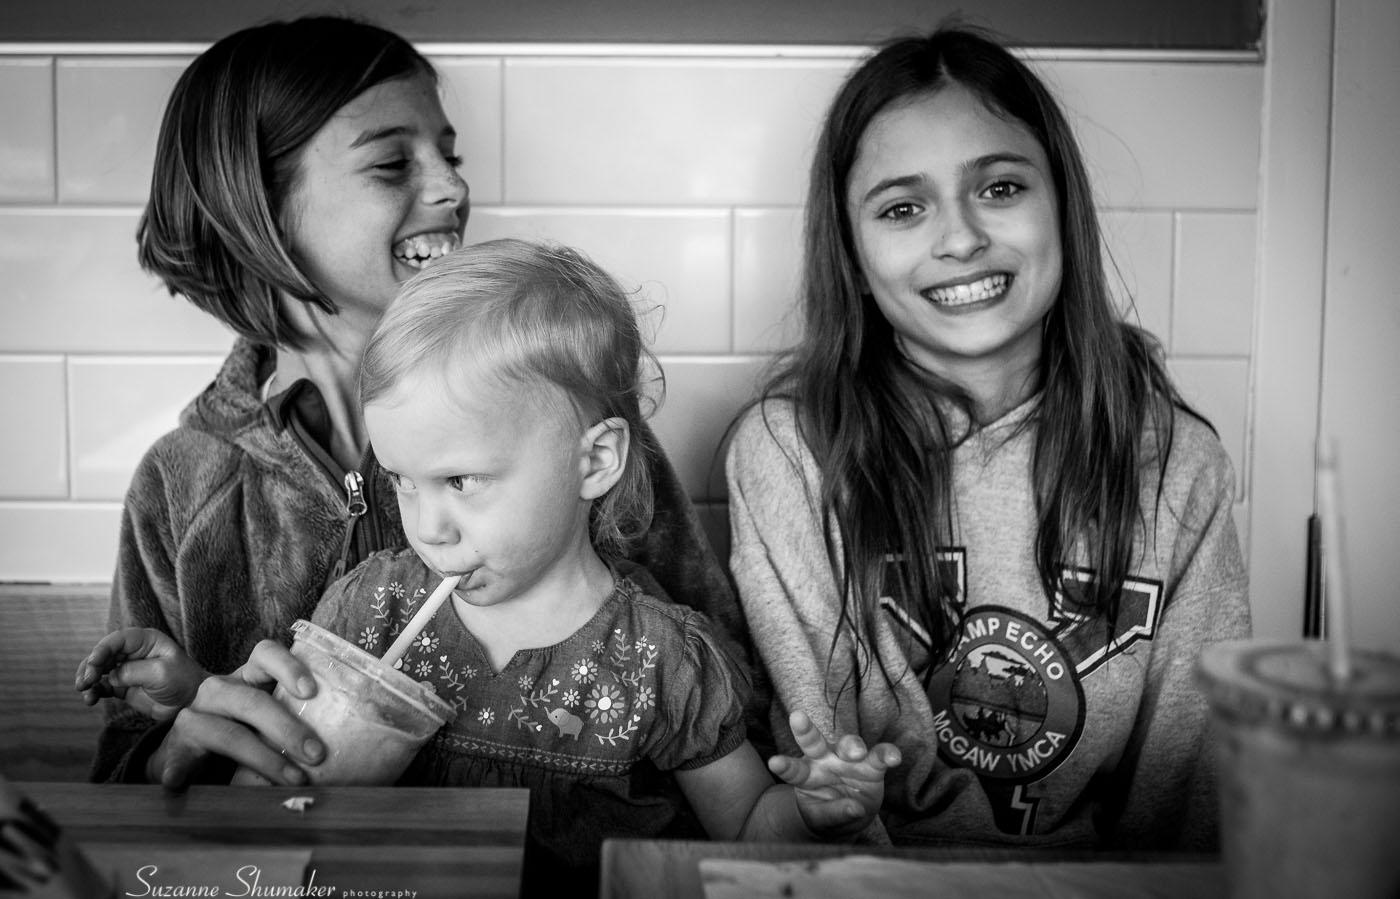 152/366 St. Baldrick's ~ Fundraiser for Pediatric Cancers